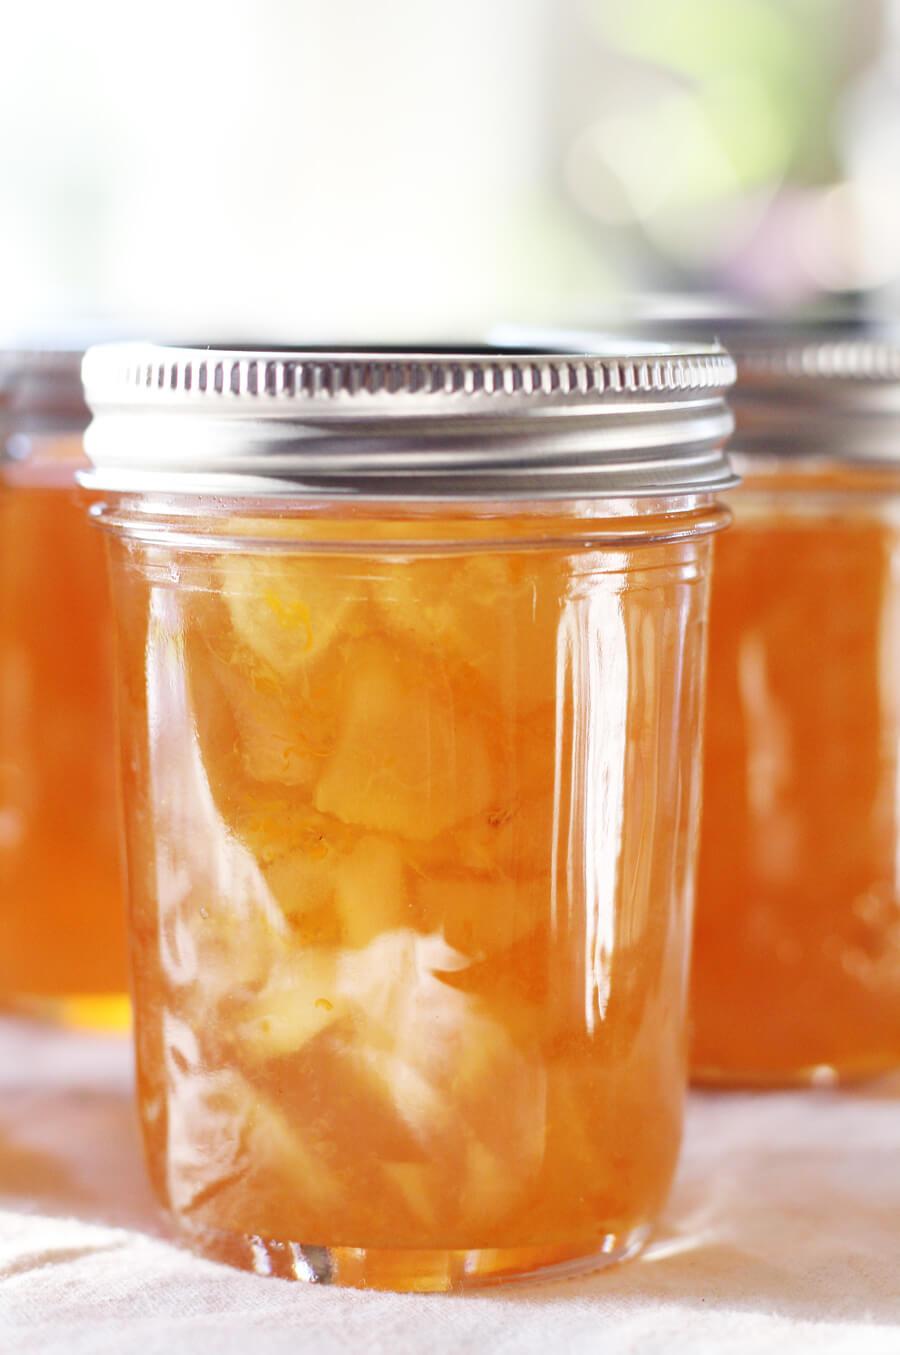 A bright, golden jar of pear preserves.